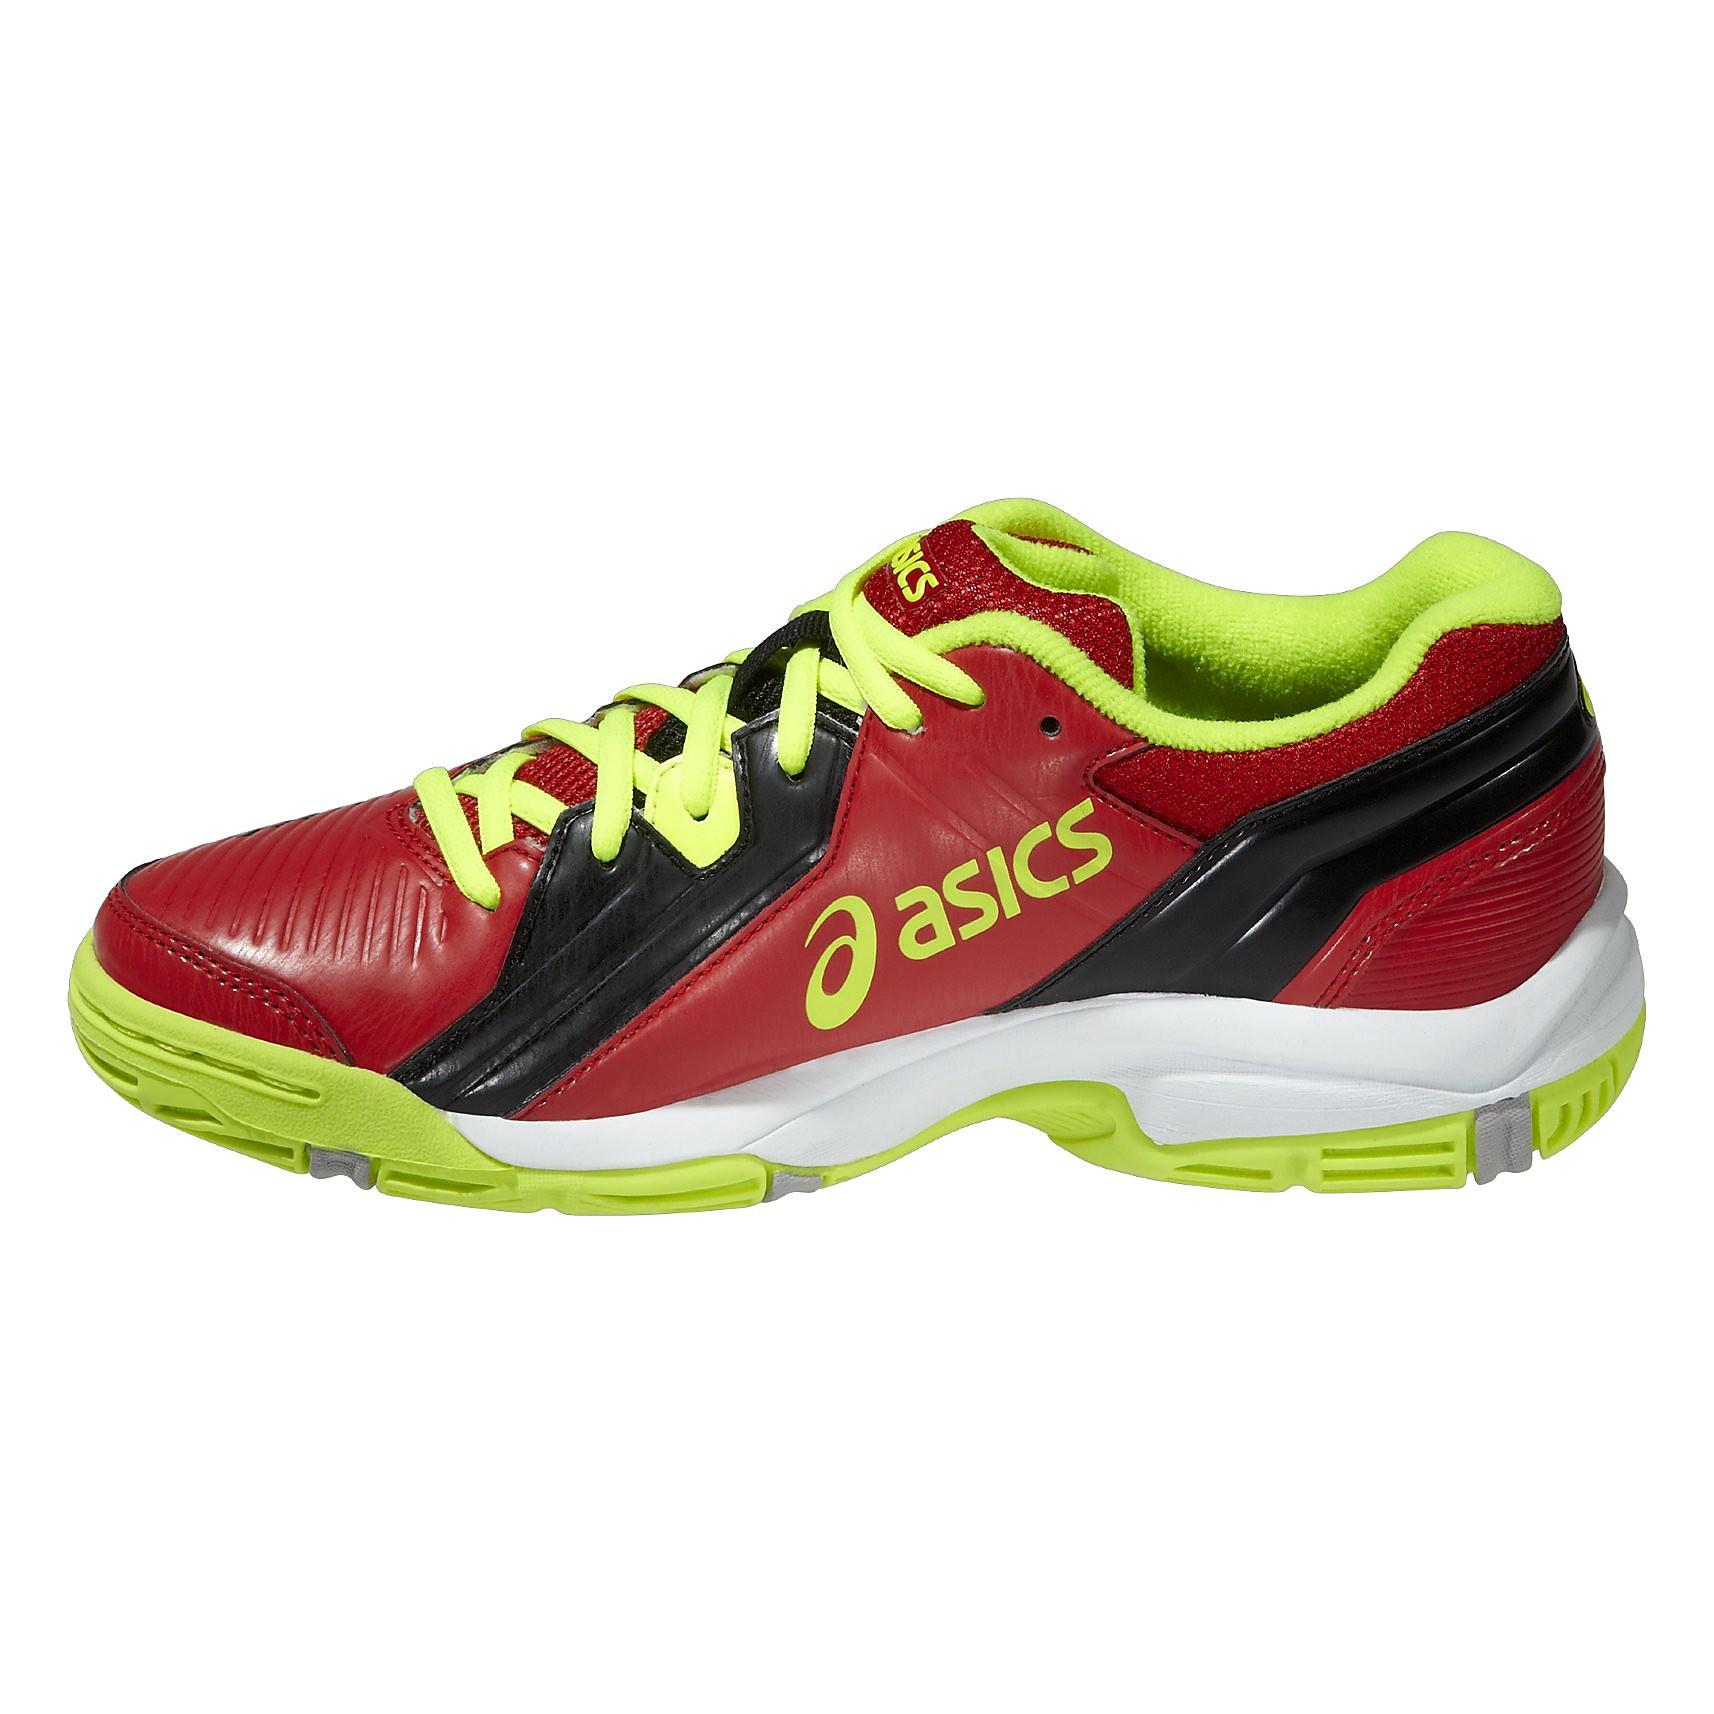 Asics Gel-Blast 6 Court Shoes